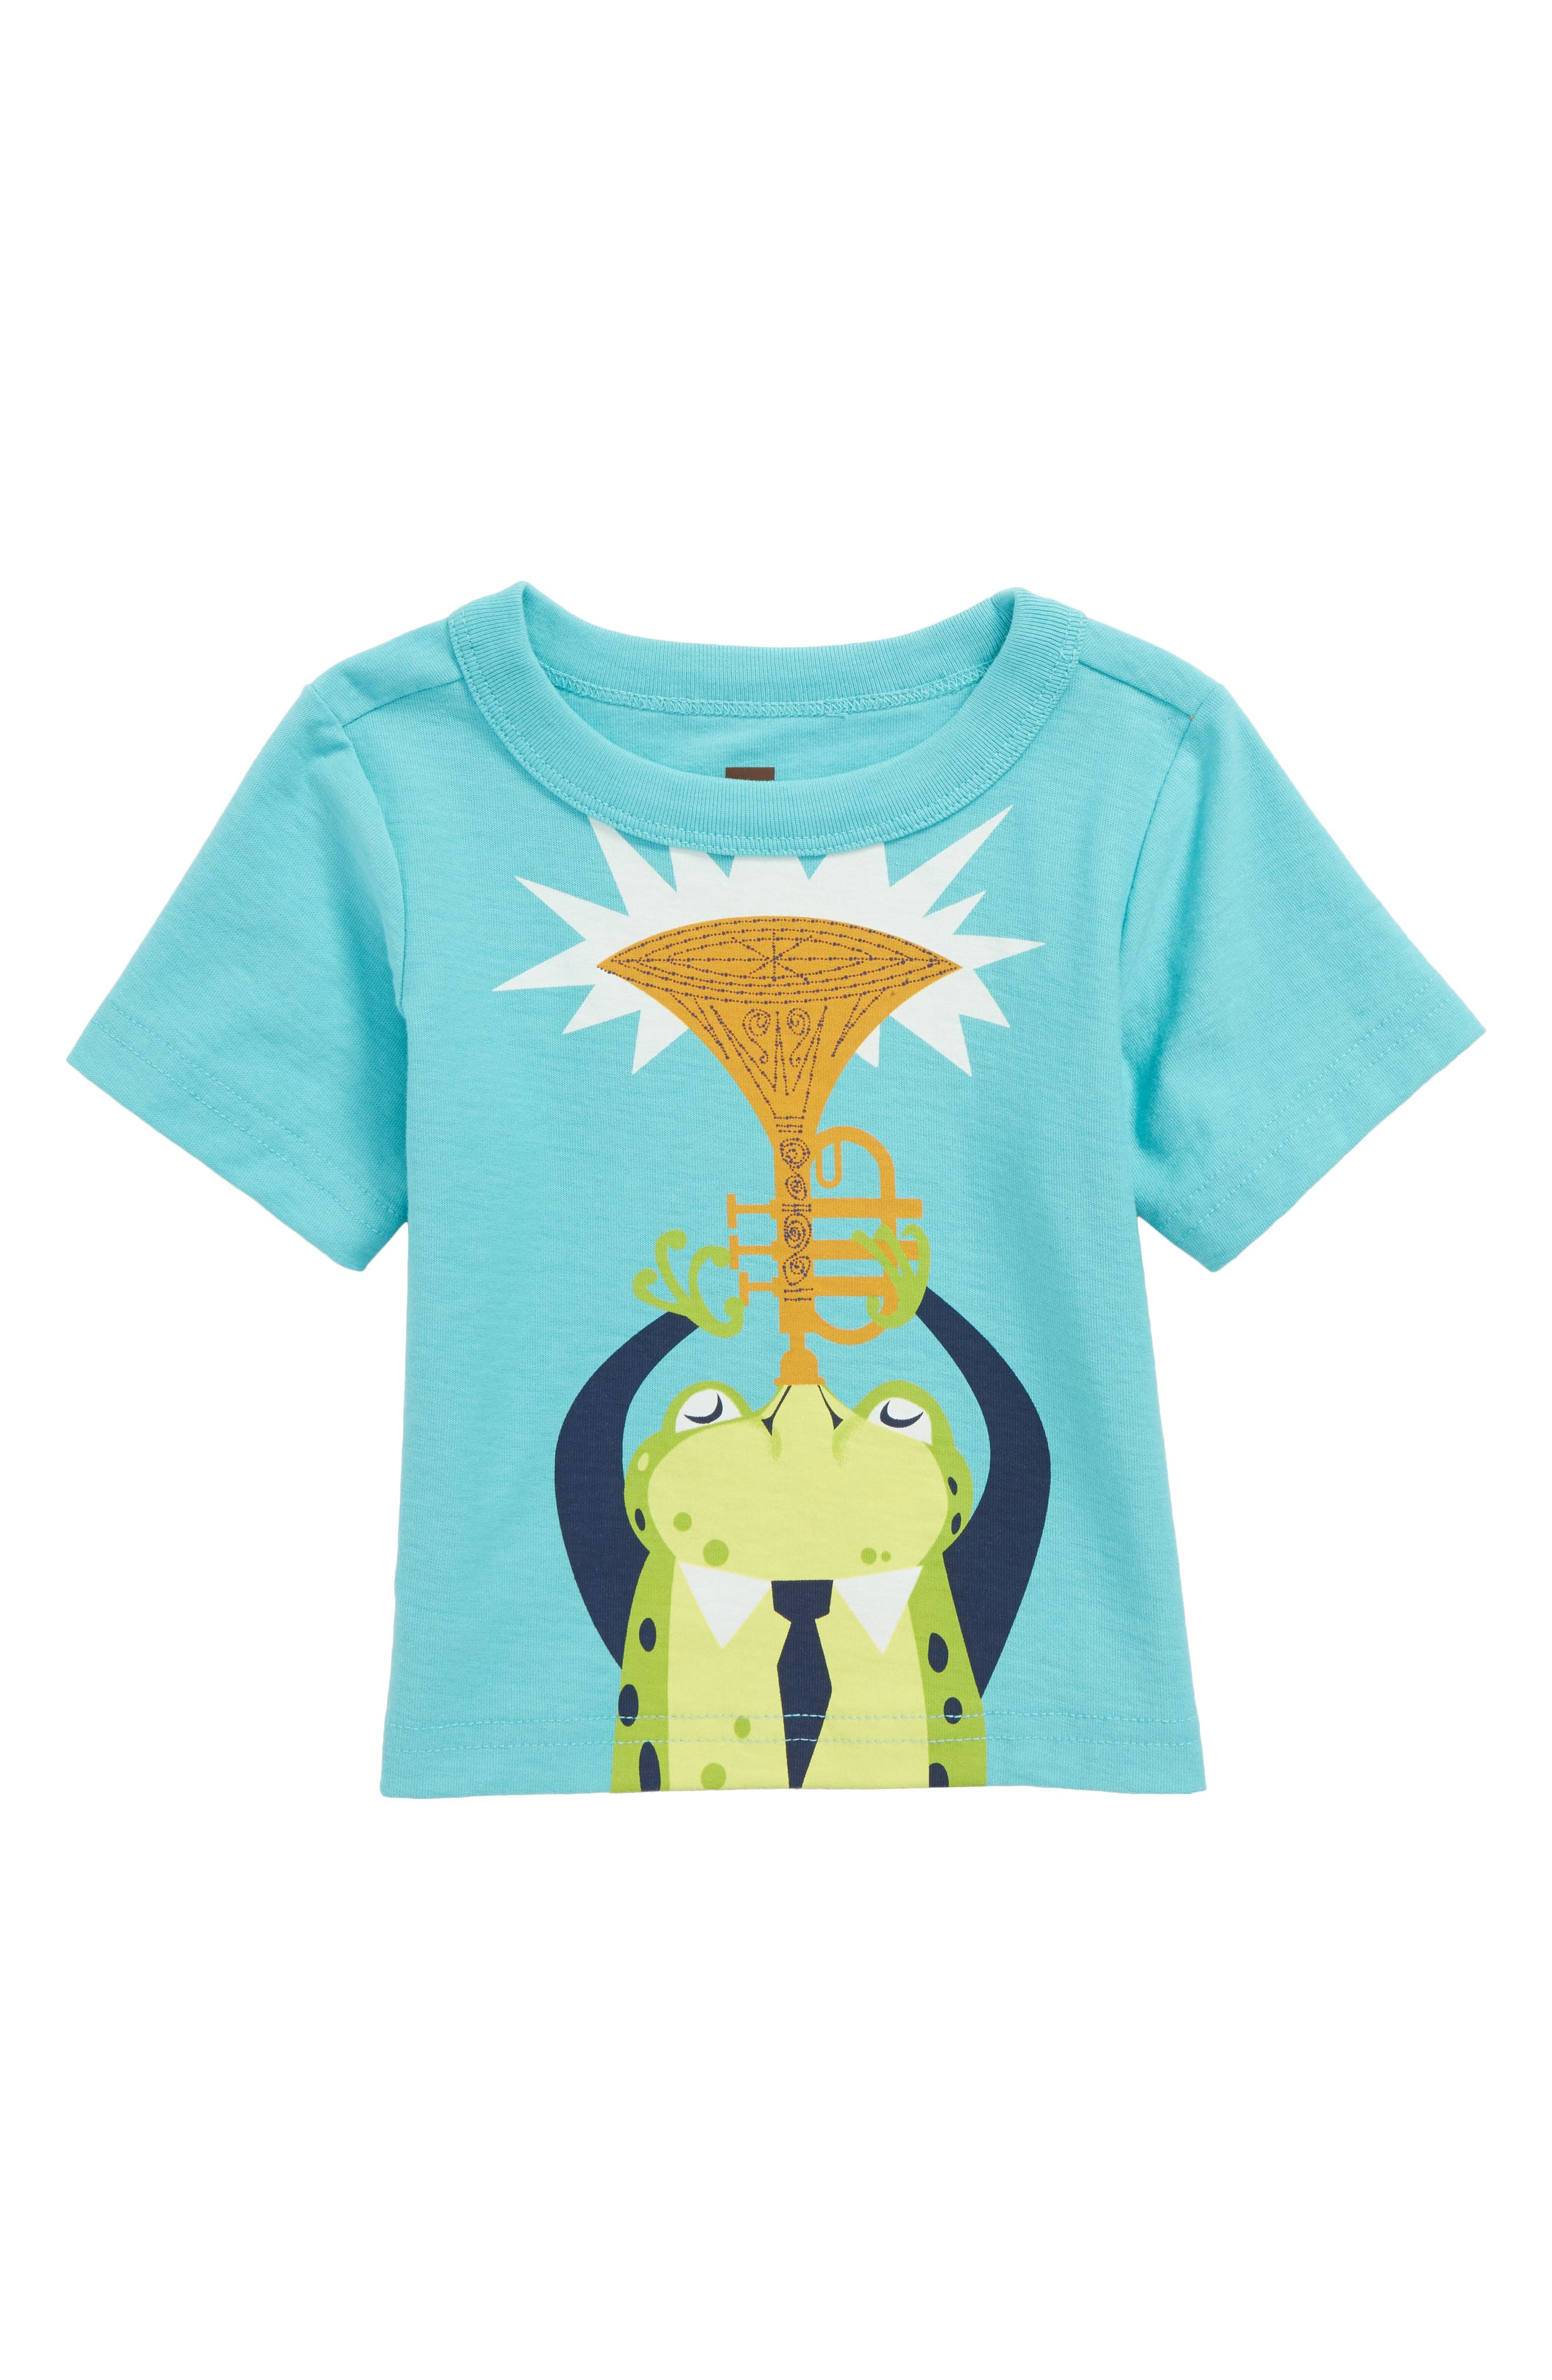 Jazz Frog T-Shirt,                         Main,                         color,